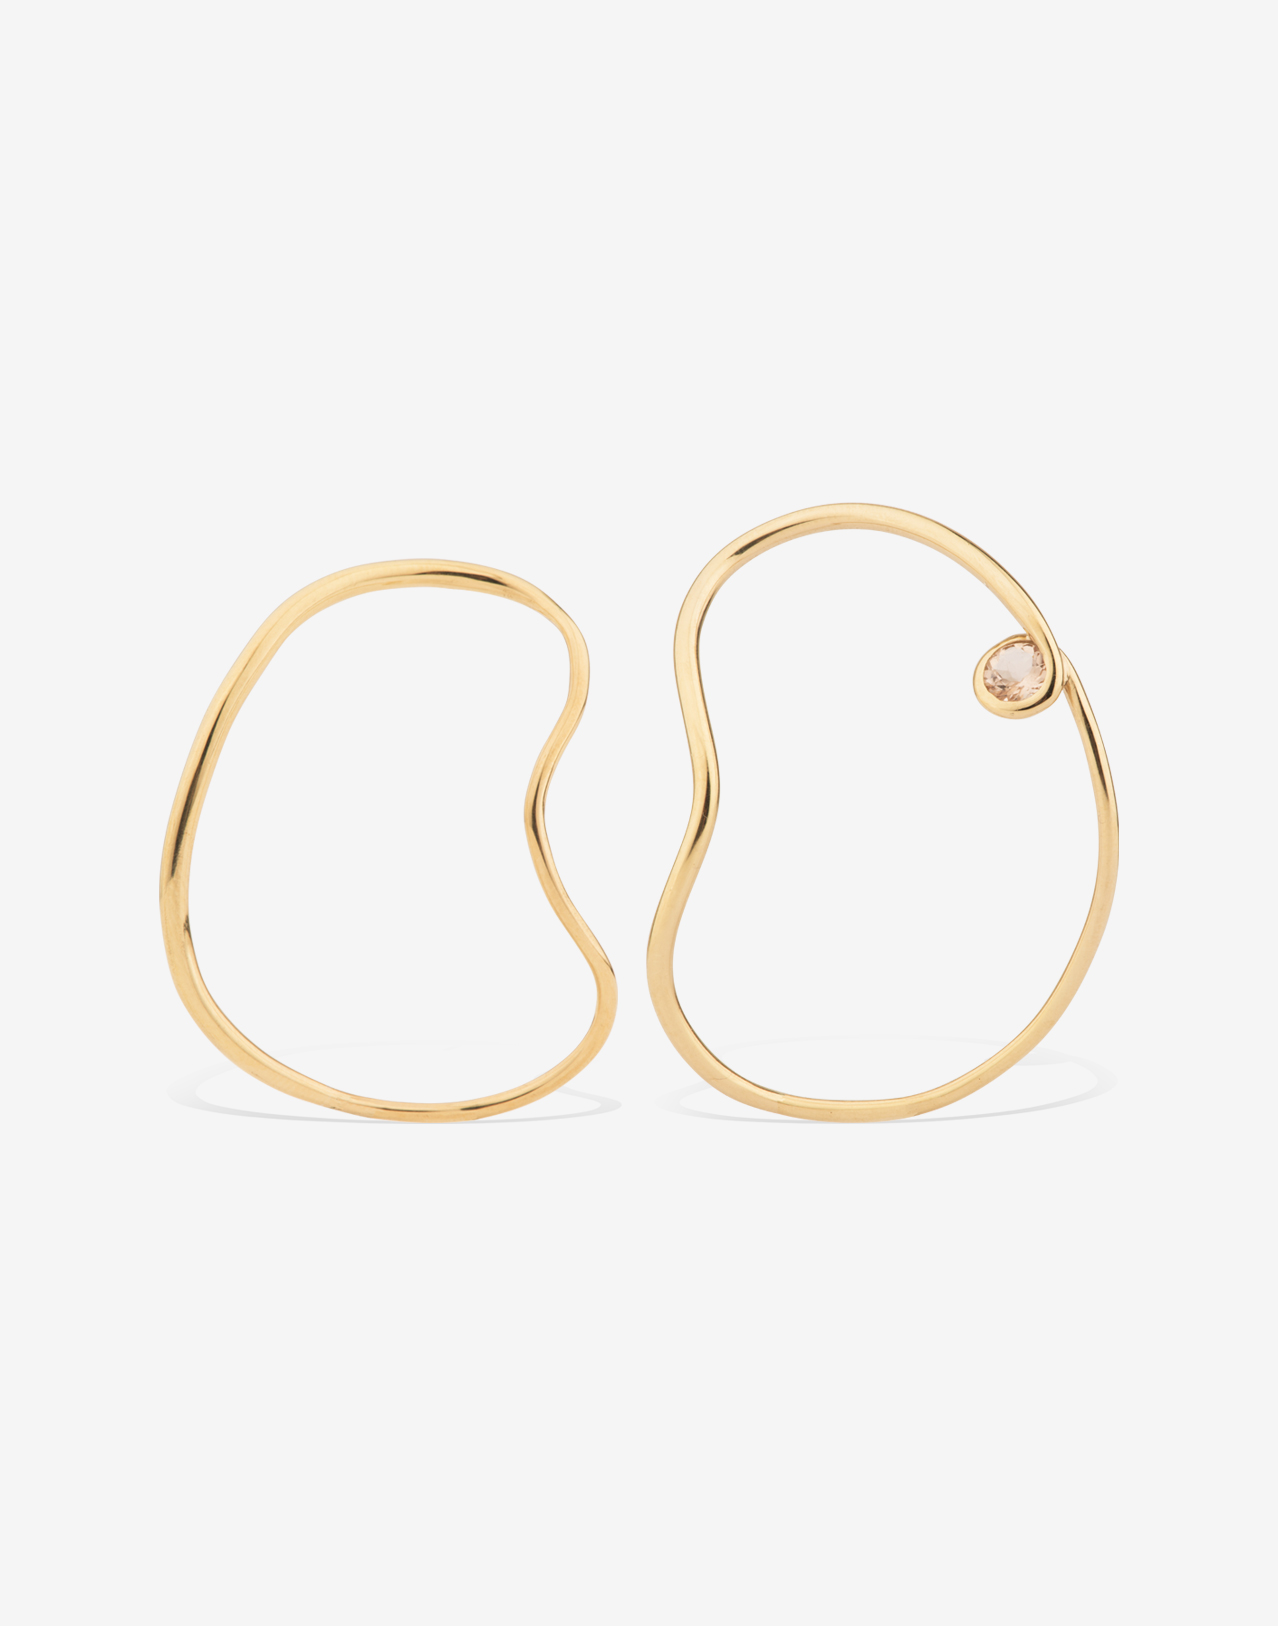 Completedworks-jewellery-S1007-Transference-Earrings-1-1.jpg